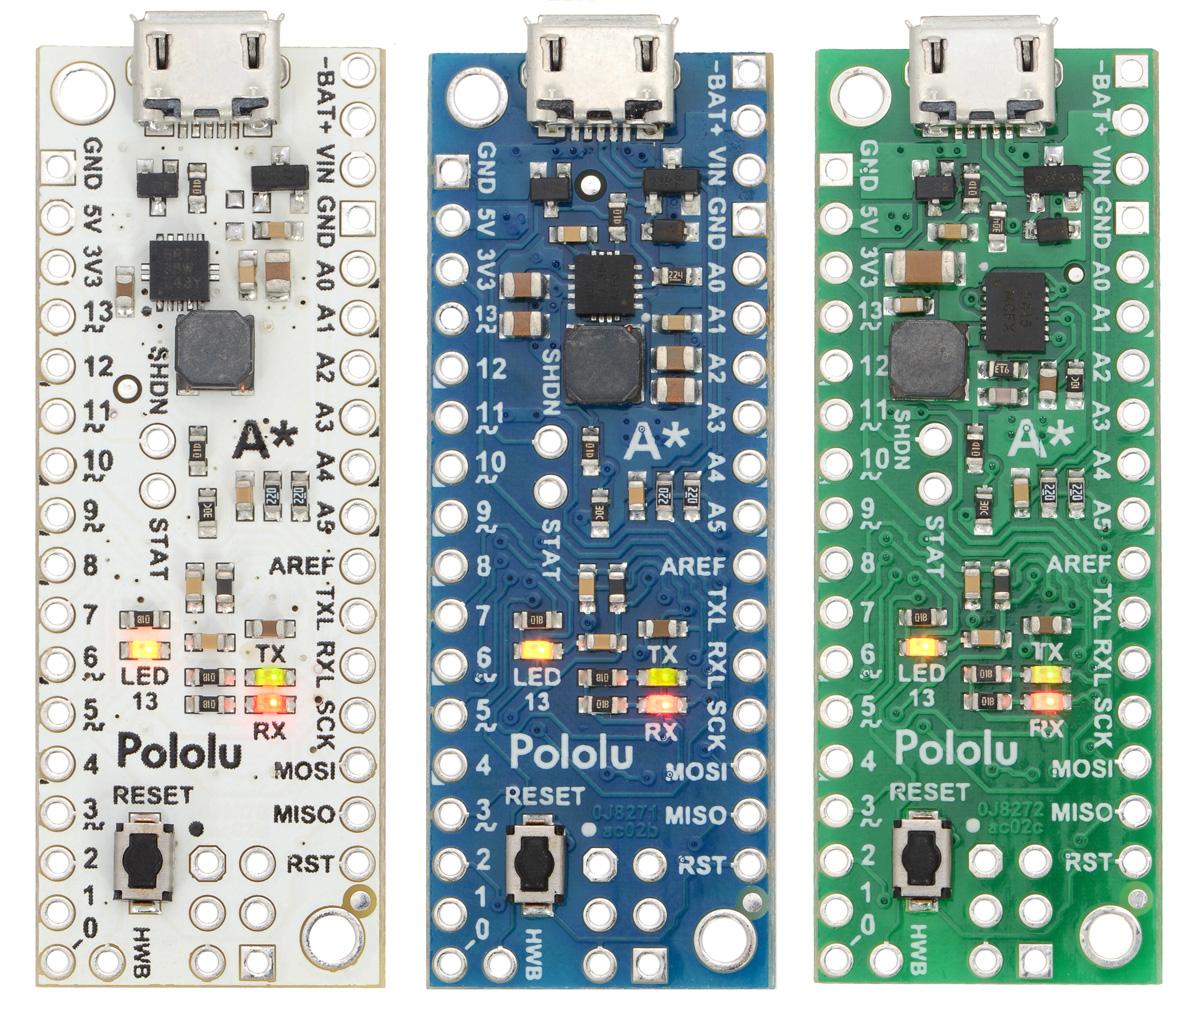 Pololu - New products: A-Star 32U4 Minis